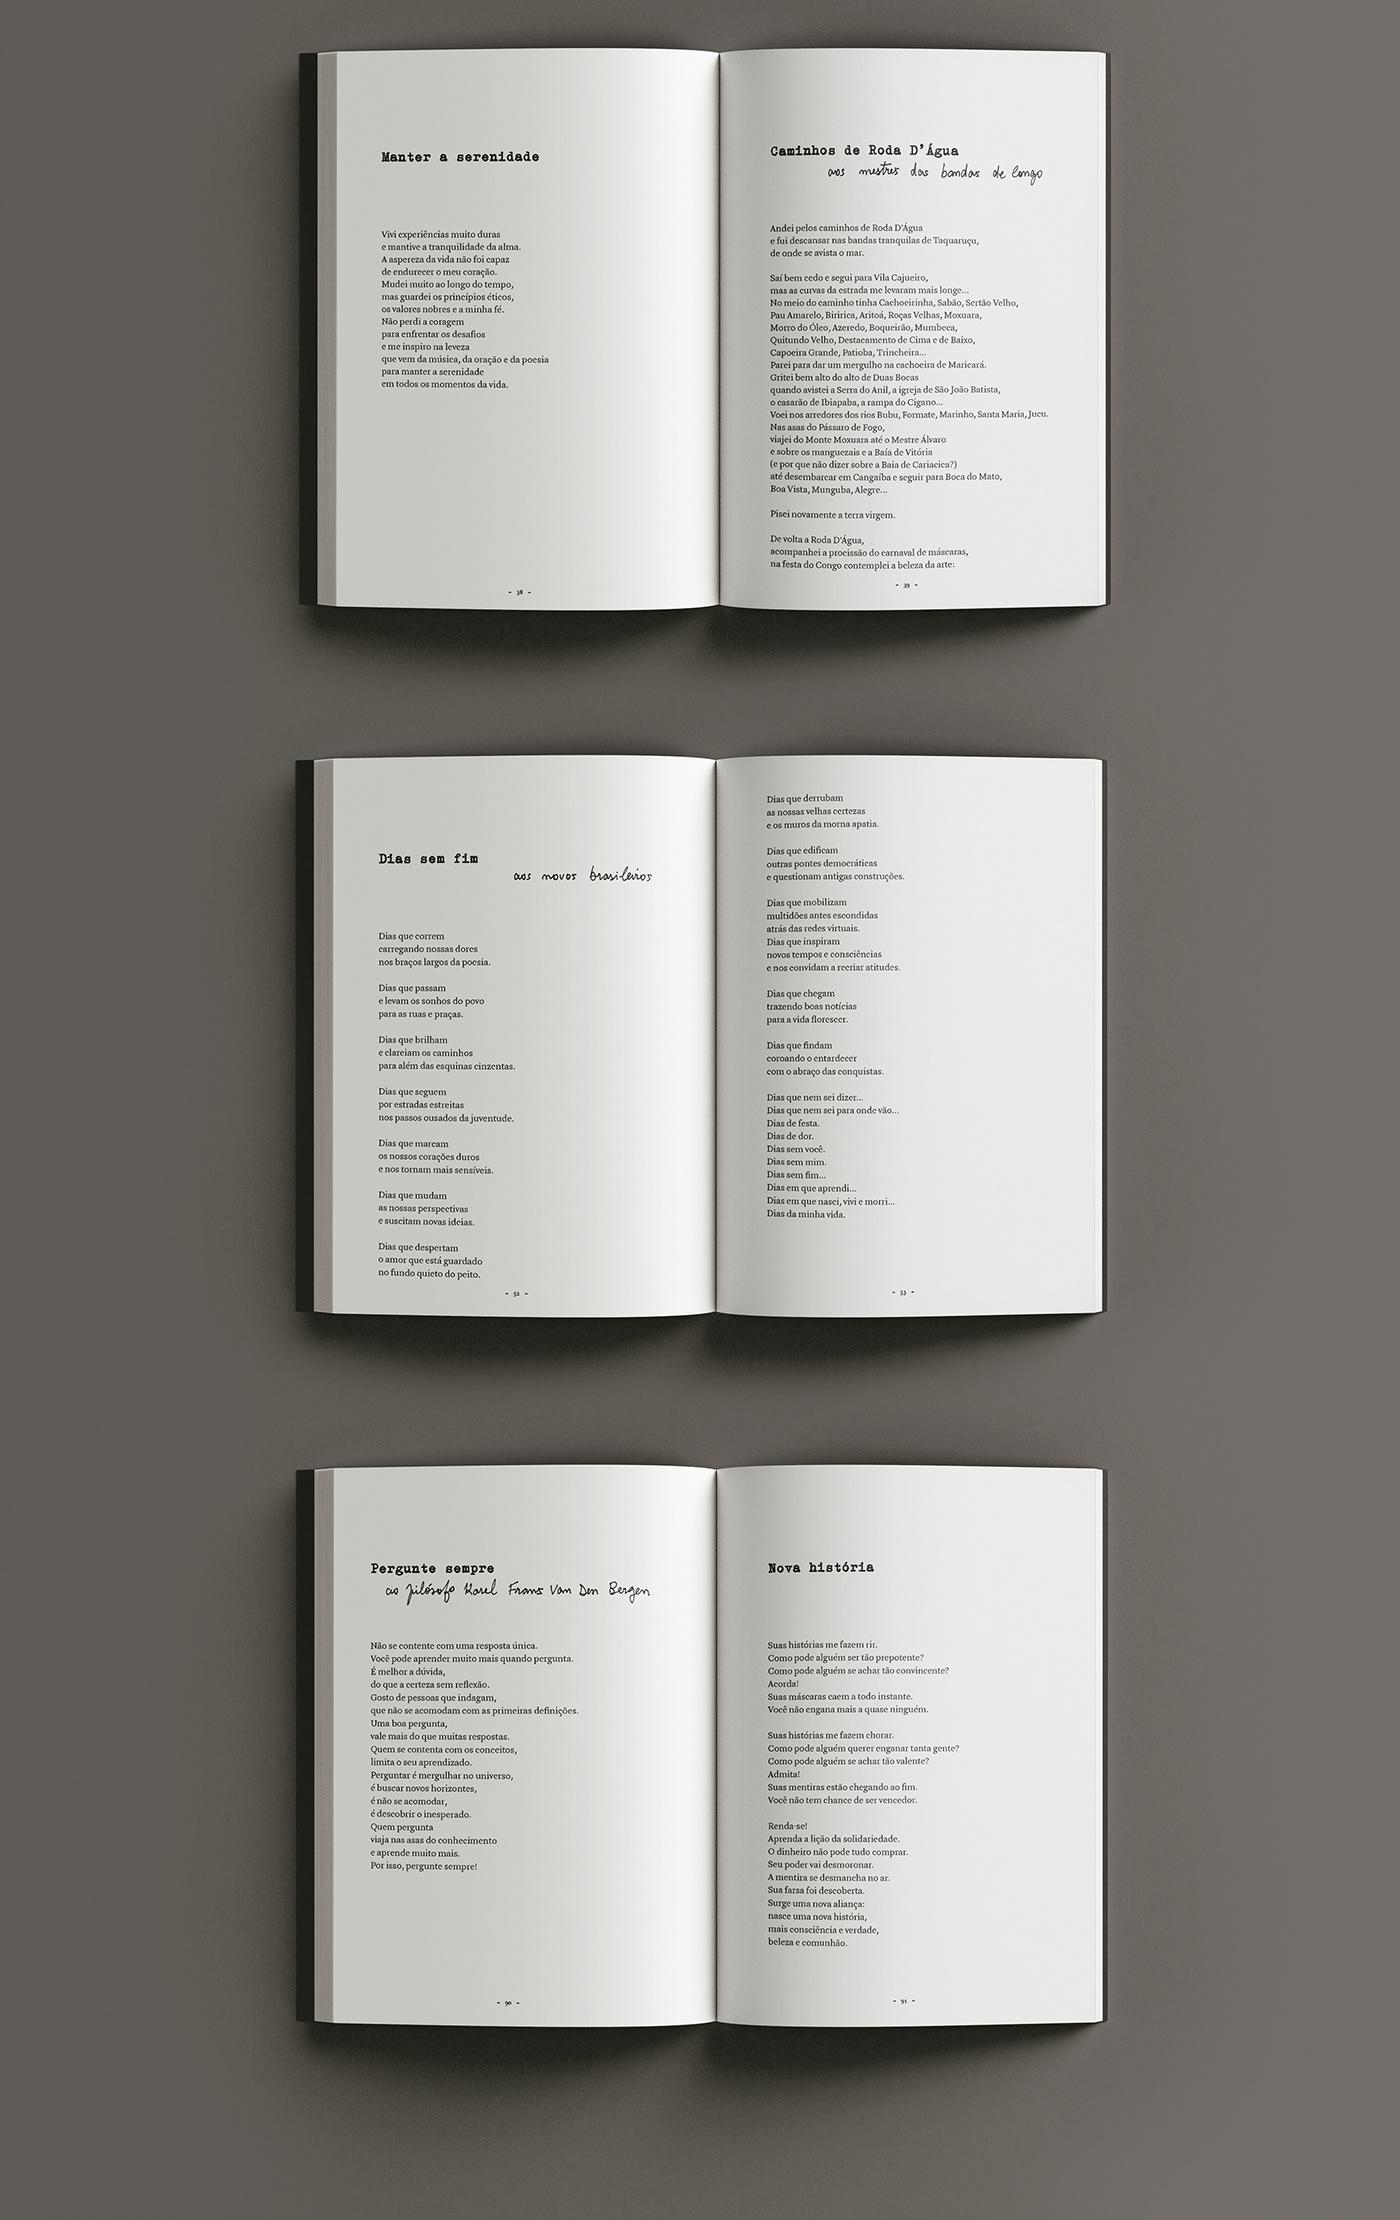 Image may contain: wall and book